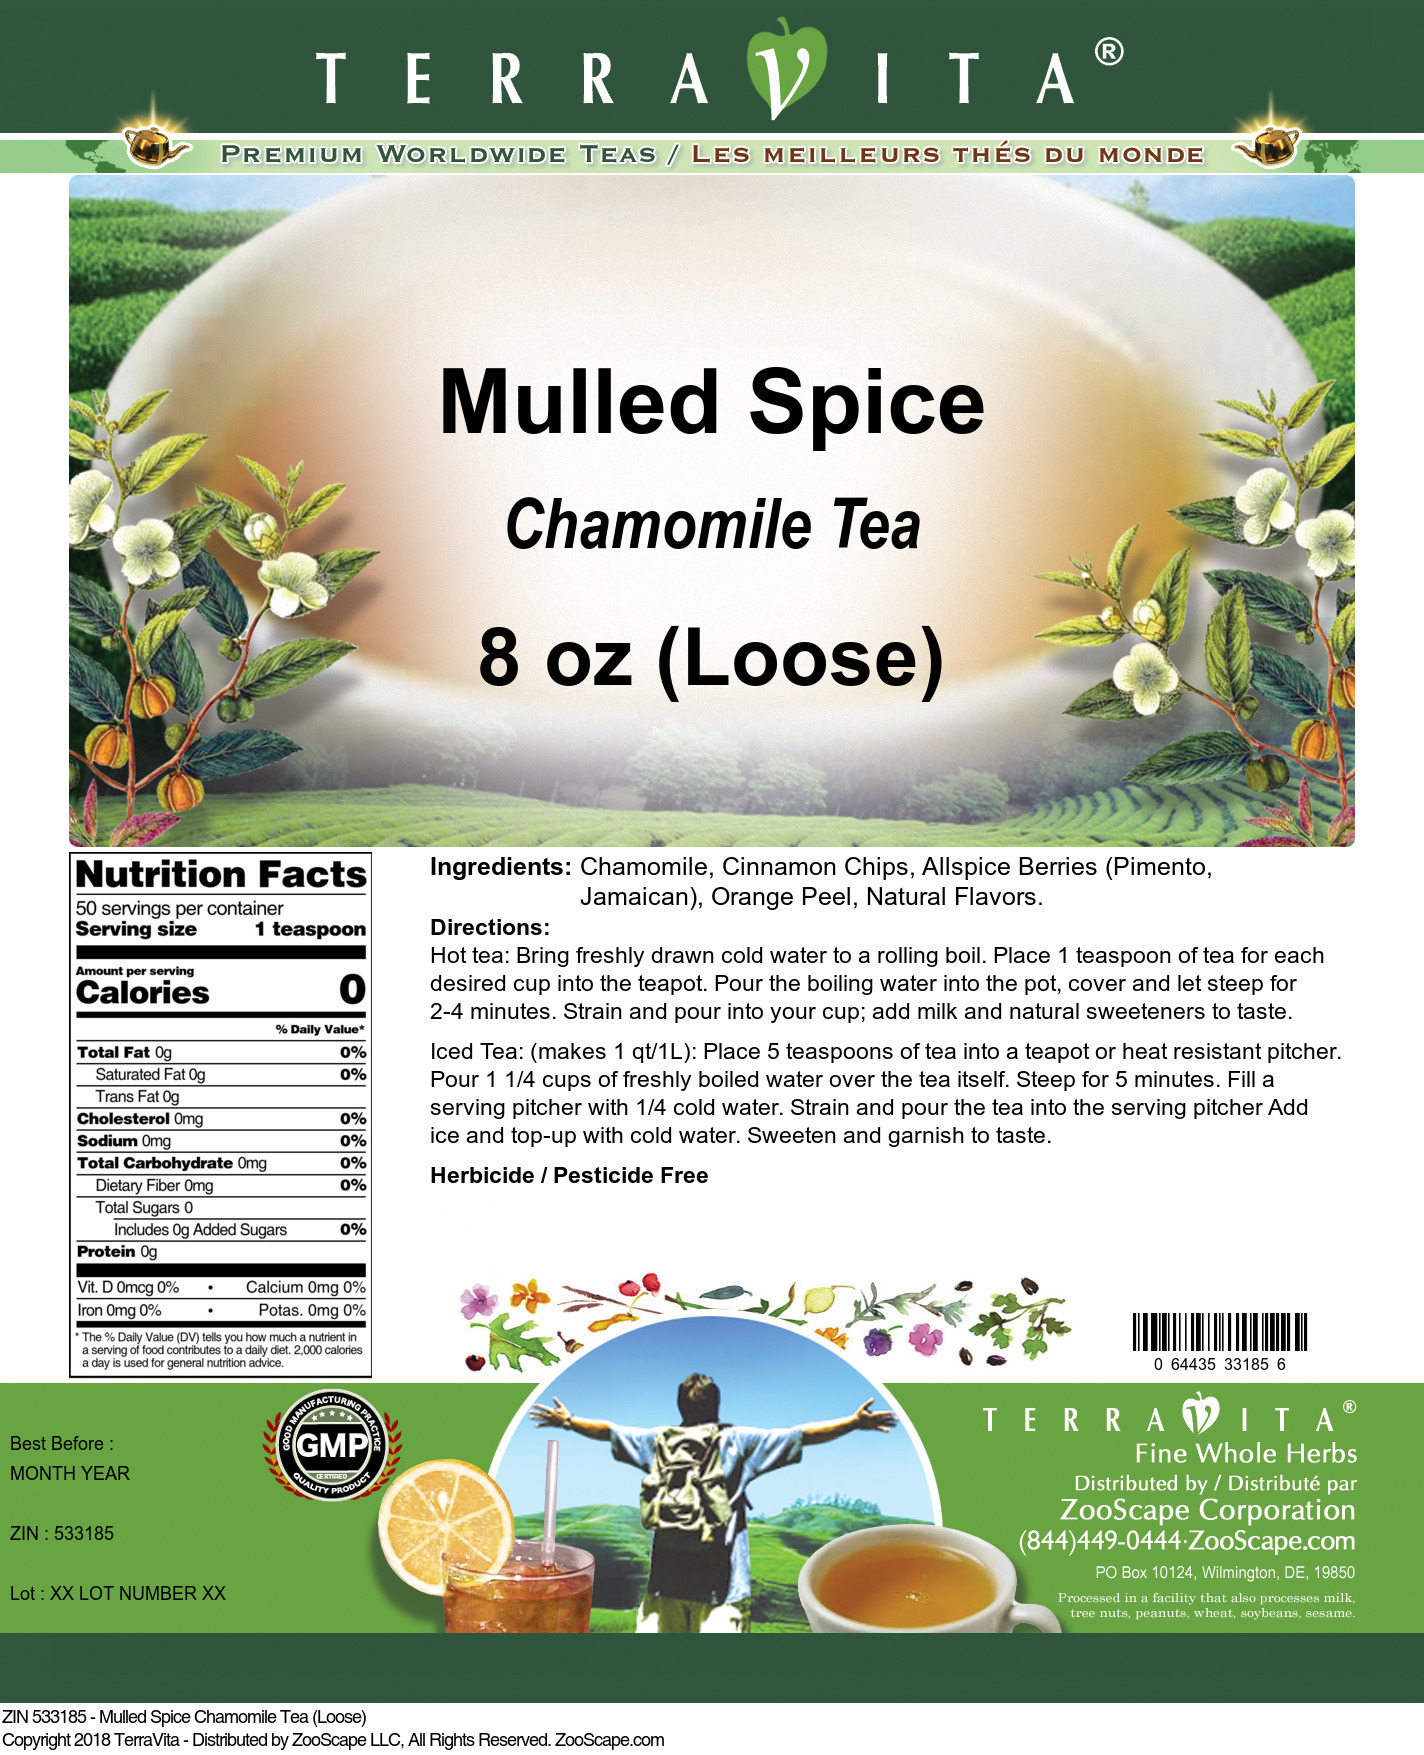 Mulled Spice Chamomile Tea (Loose)